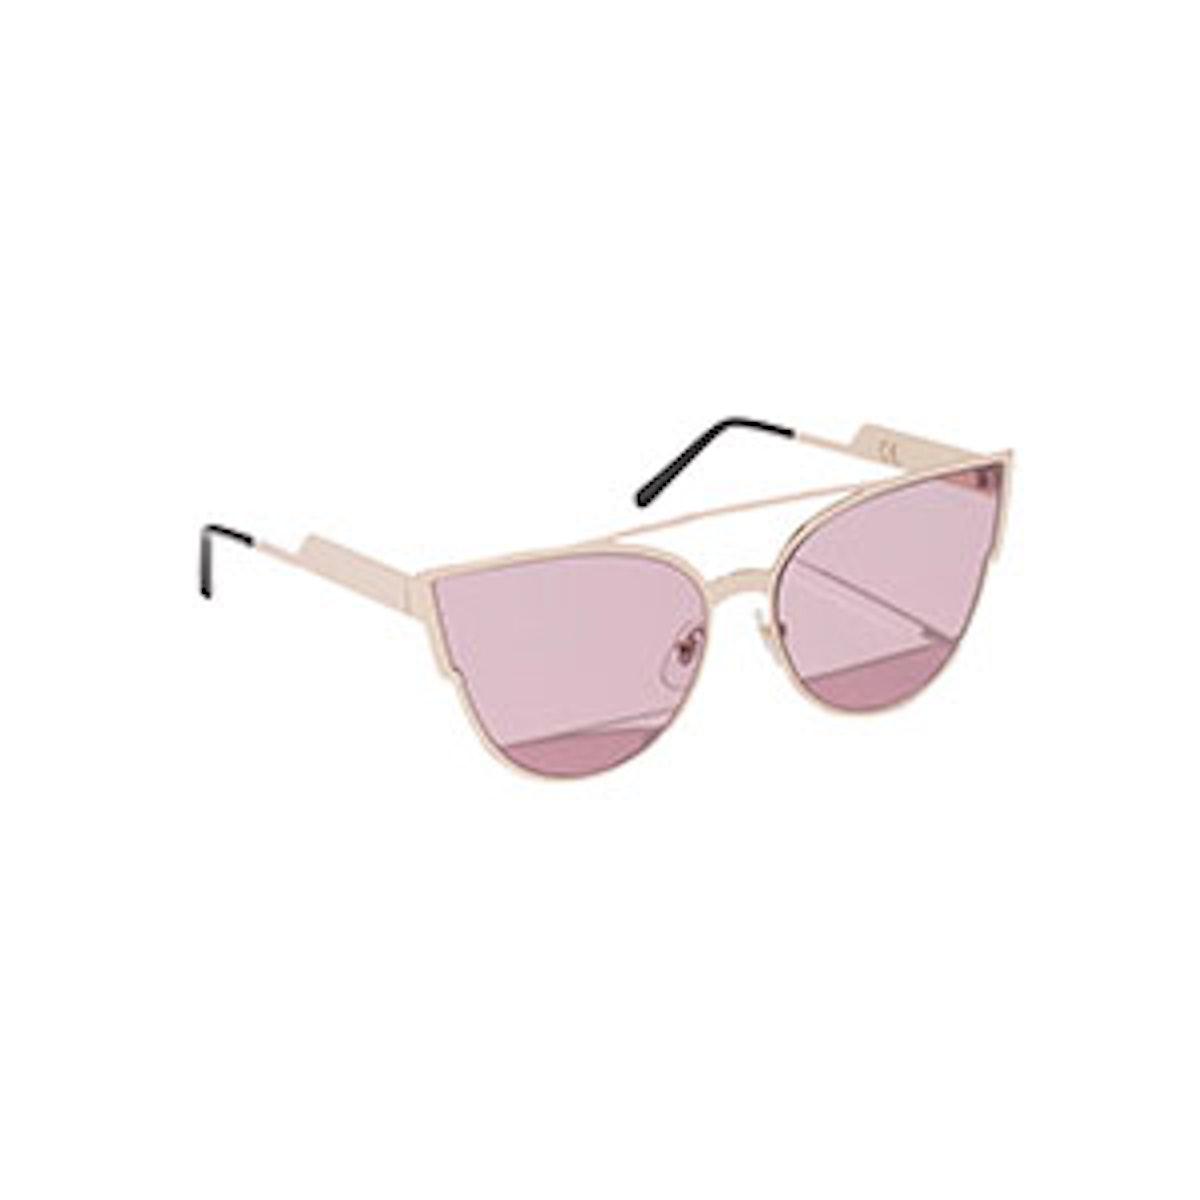 Cat Eye Sunglasses In Rose Gold/Pink